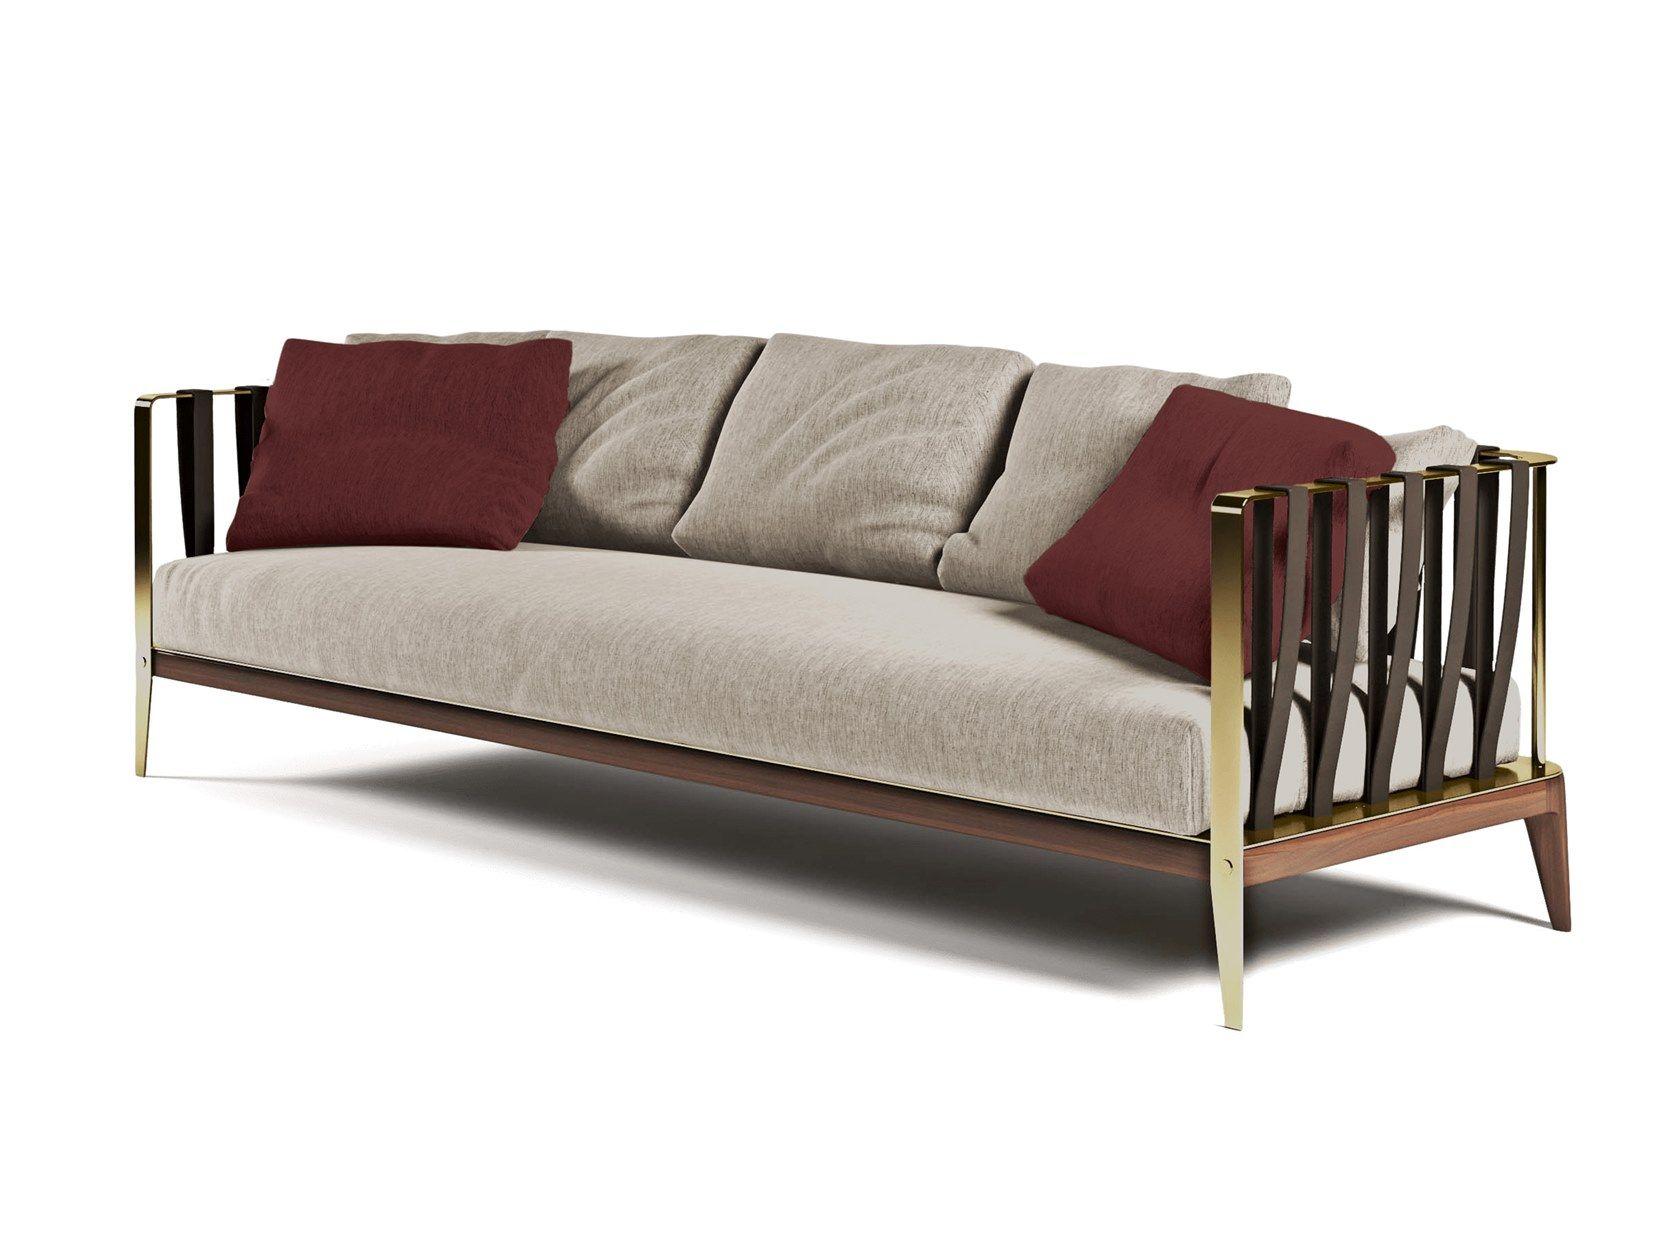 3 seater fabric sofa EMY By Formitalia in 2020 Sofa